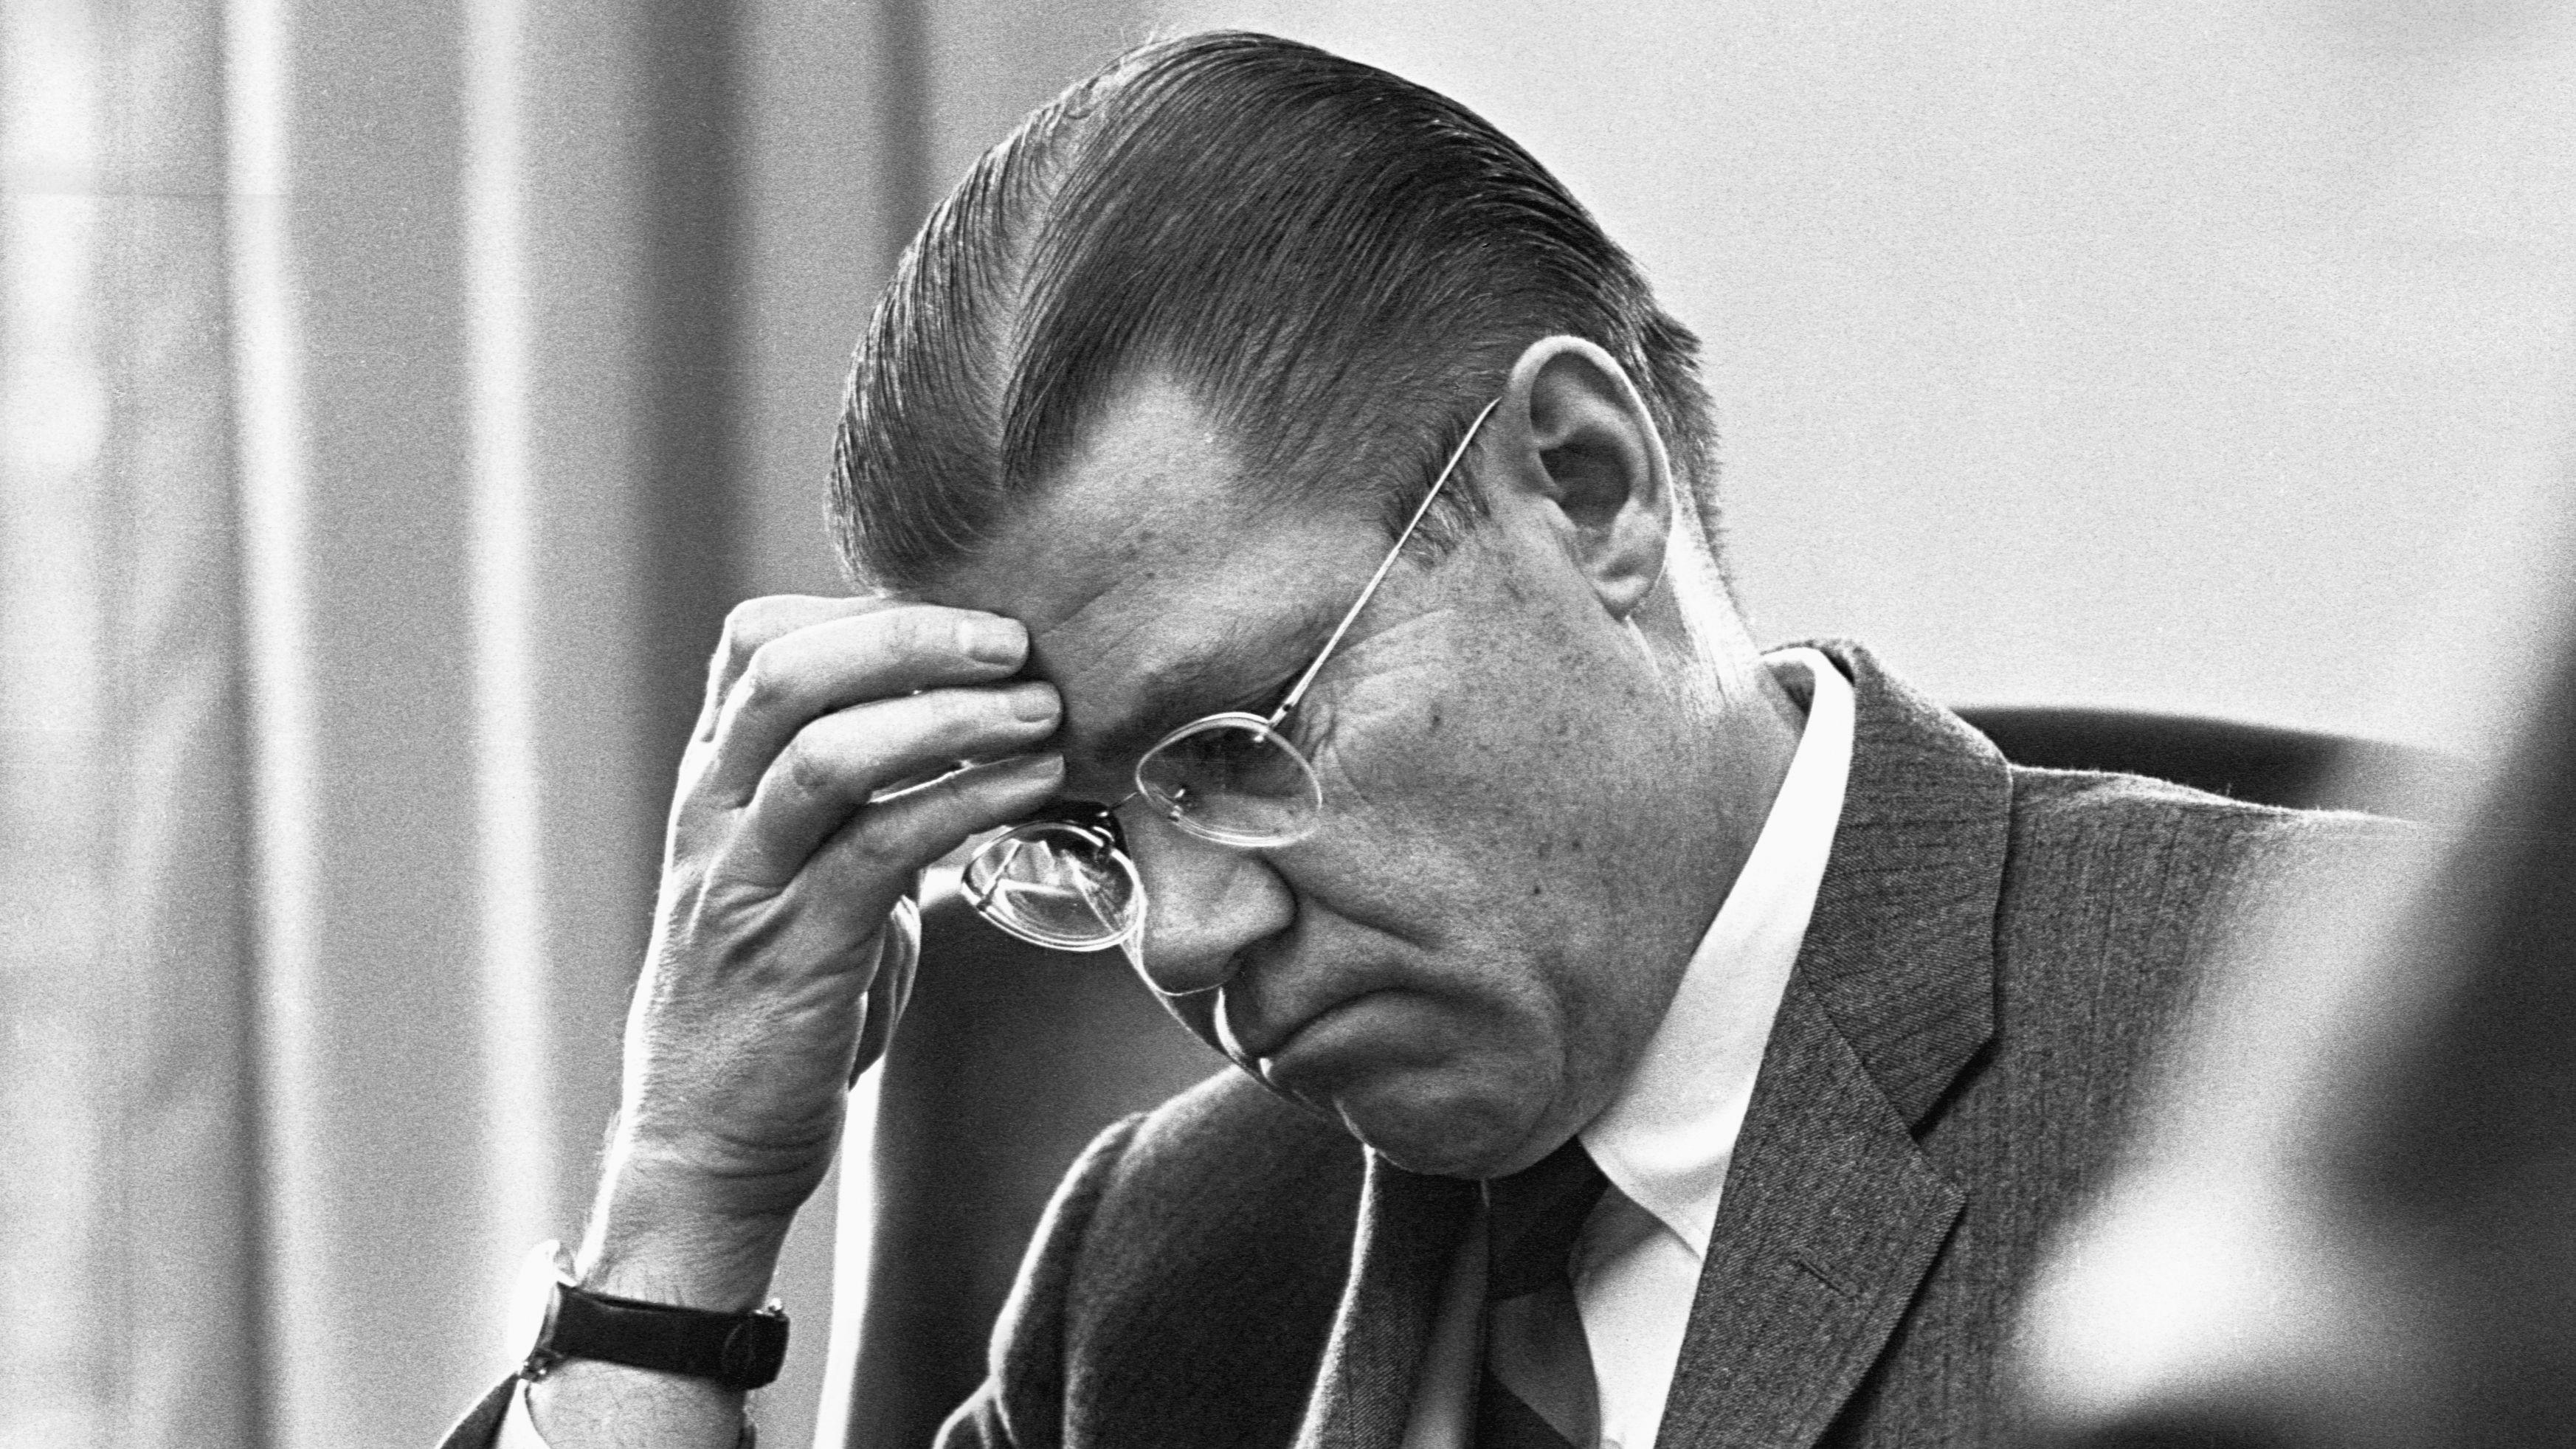 Biography of Robert McNamara, Vietnam War Architect